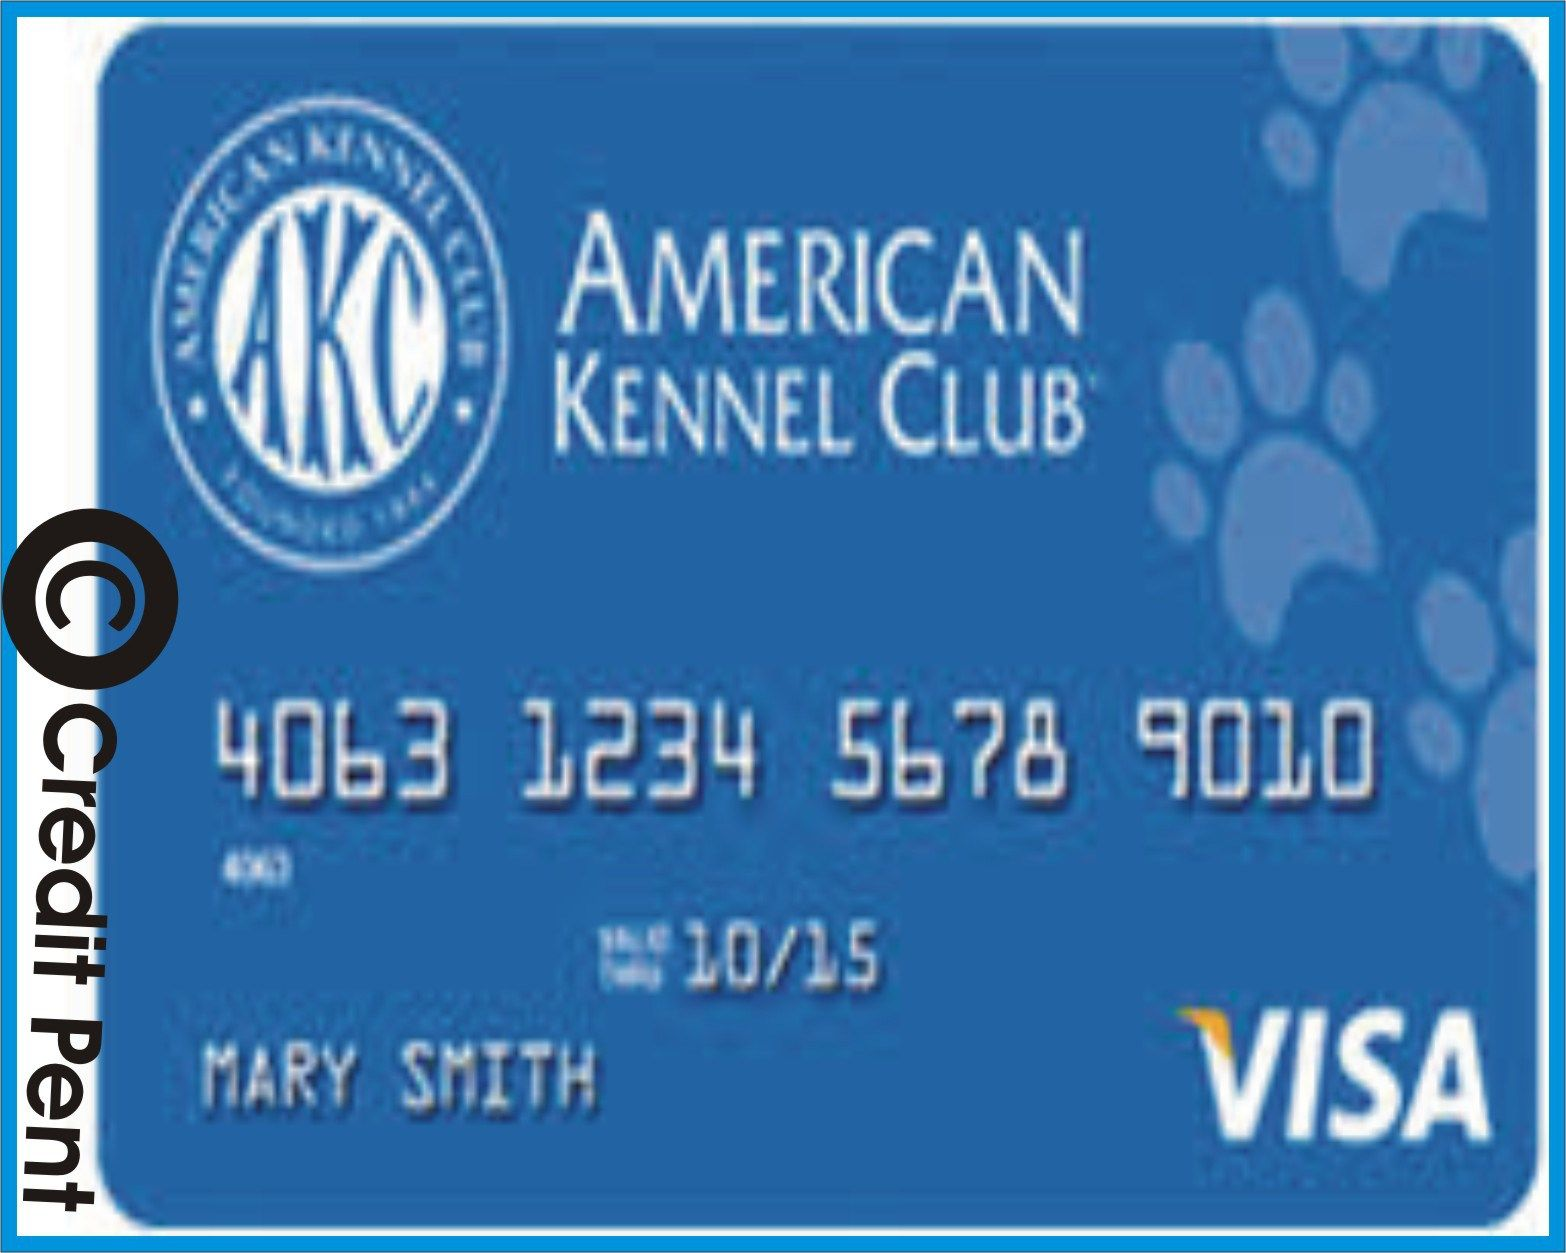 ikea credit card payment address